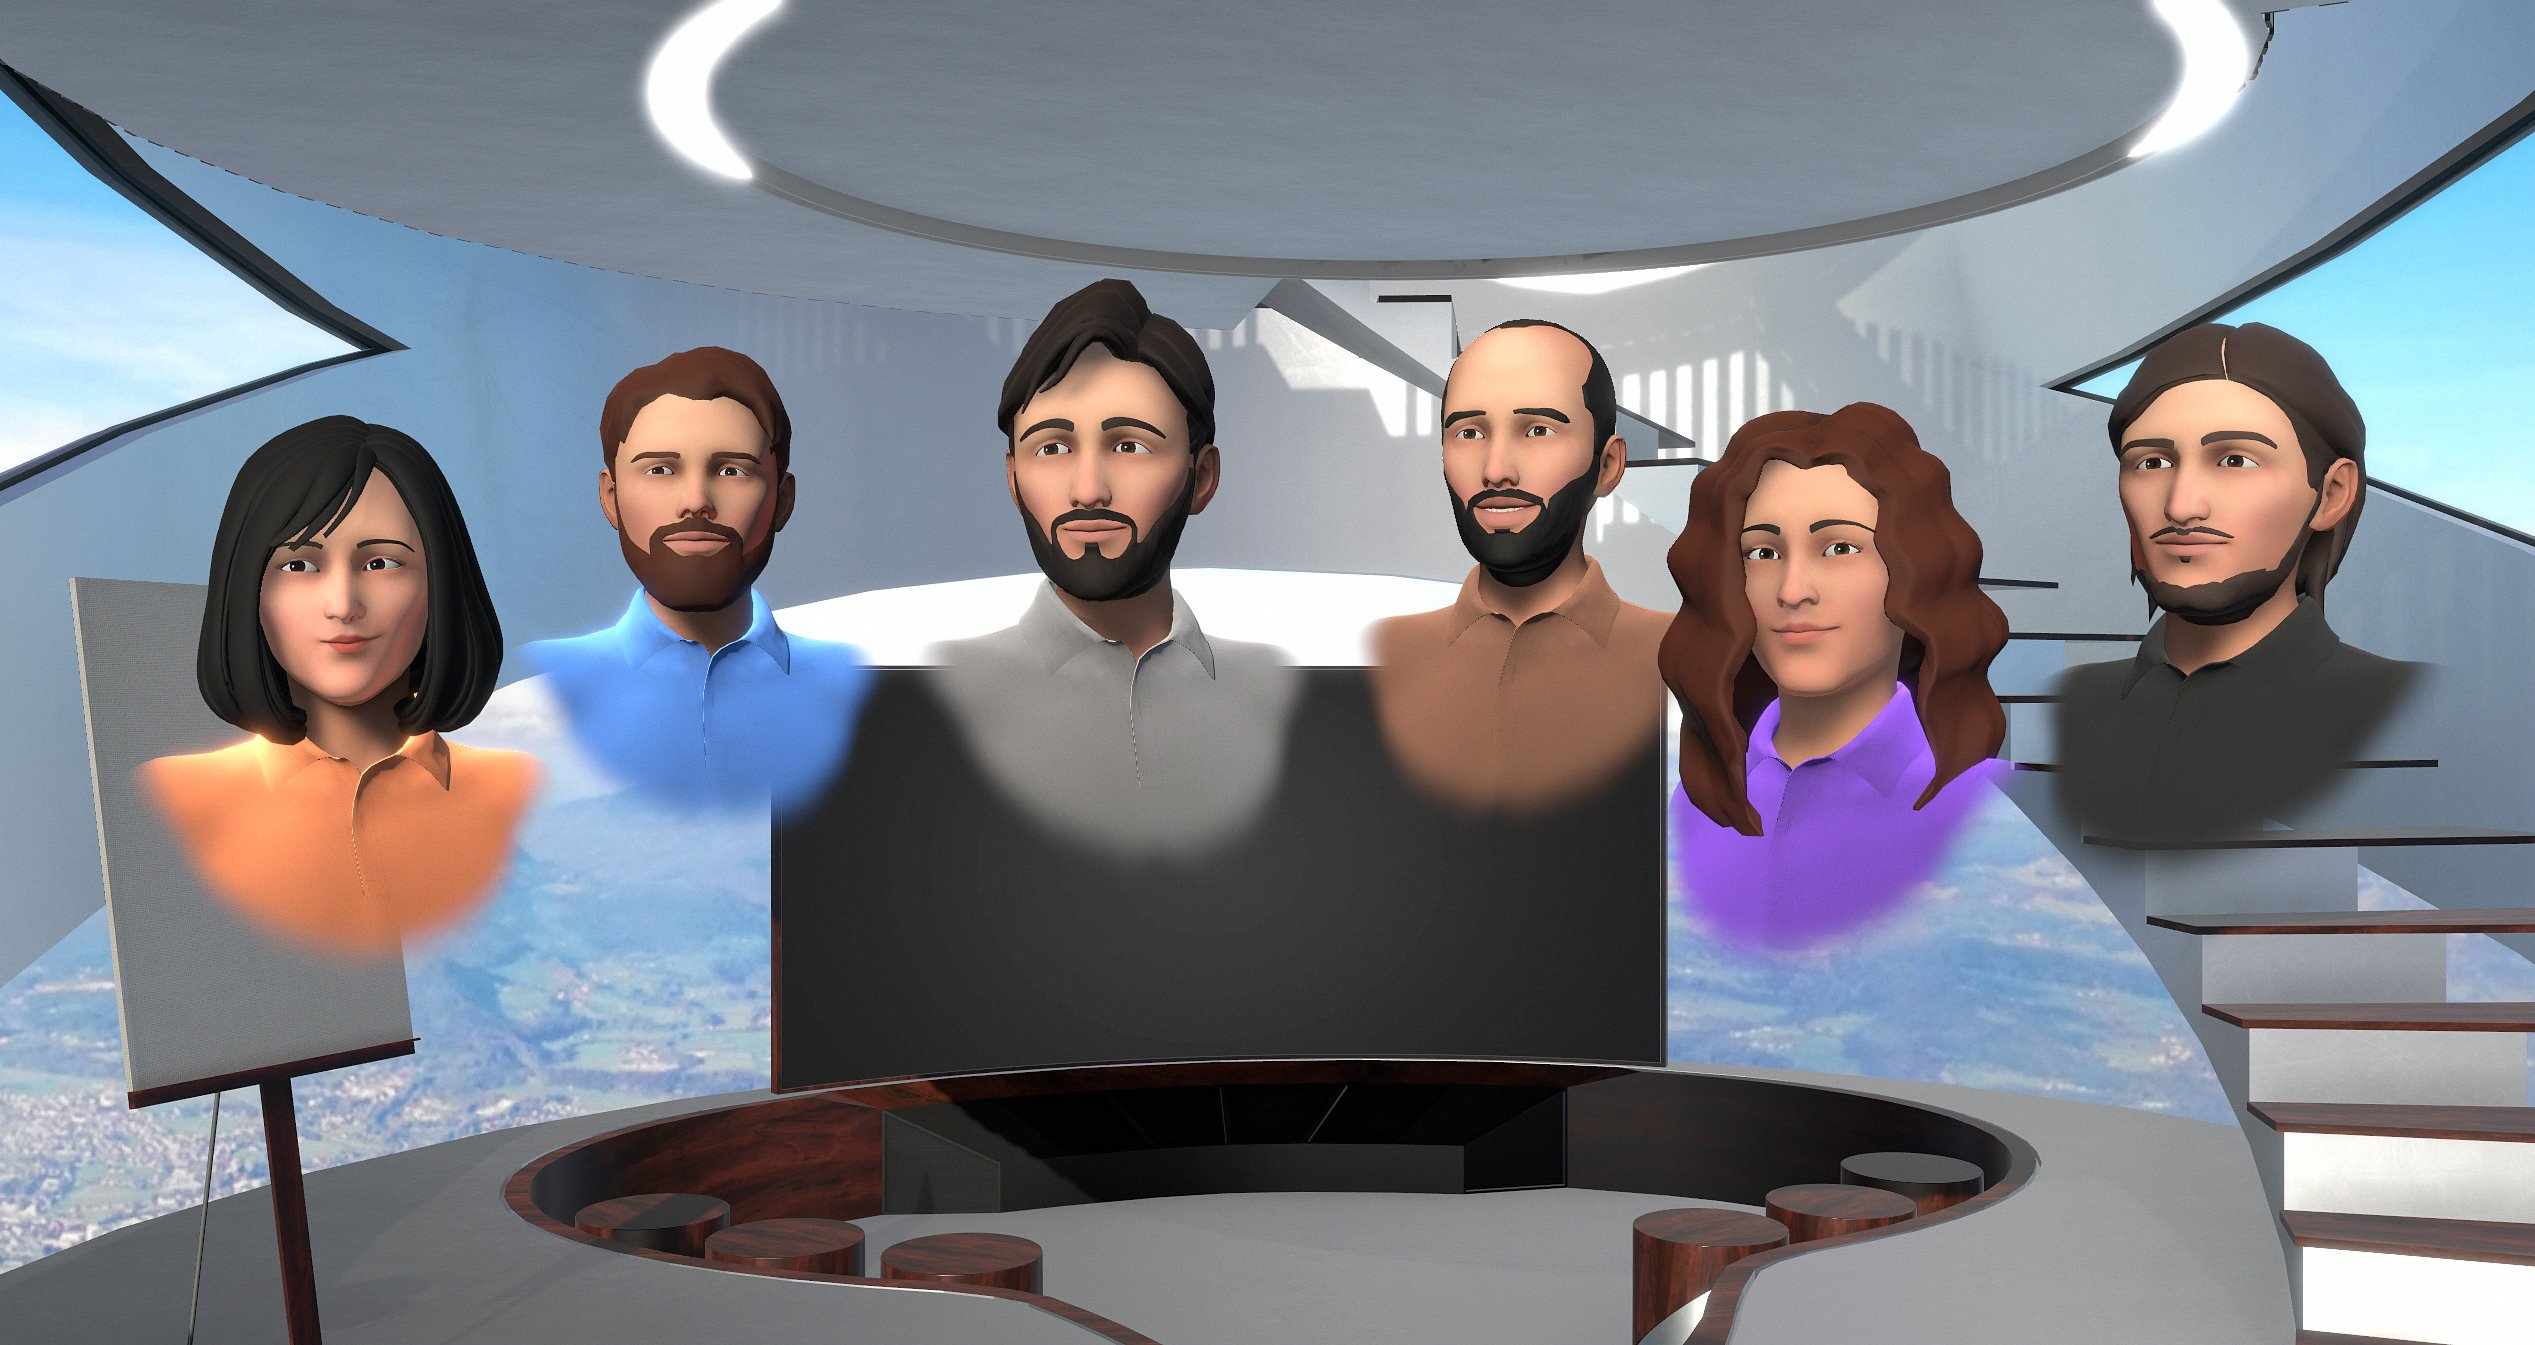 meetinvr Wolf 3D VR avatar virtual 2020